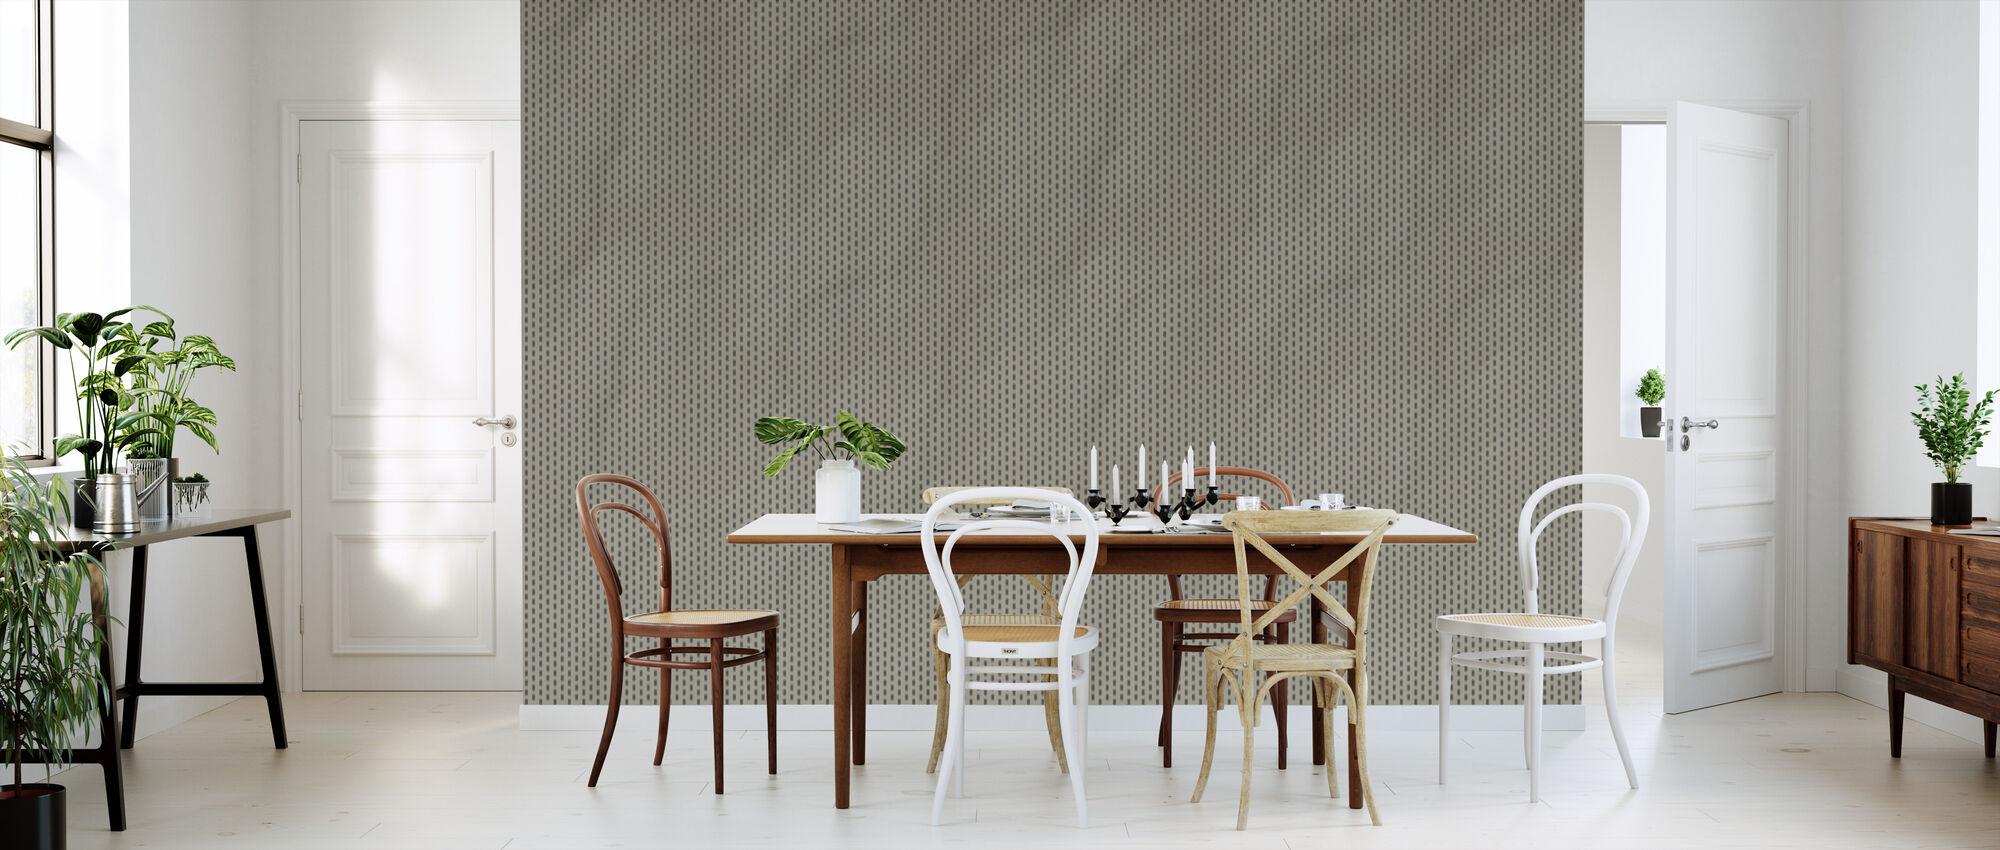 Enoone - Wallpaper - Kitchen